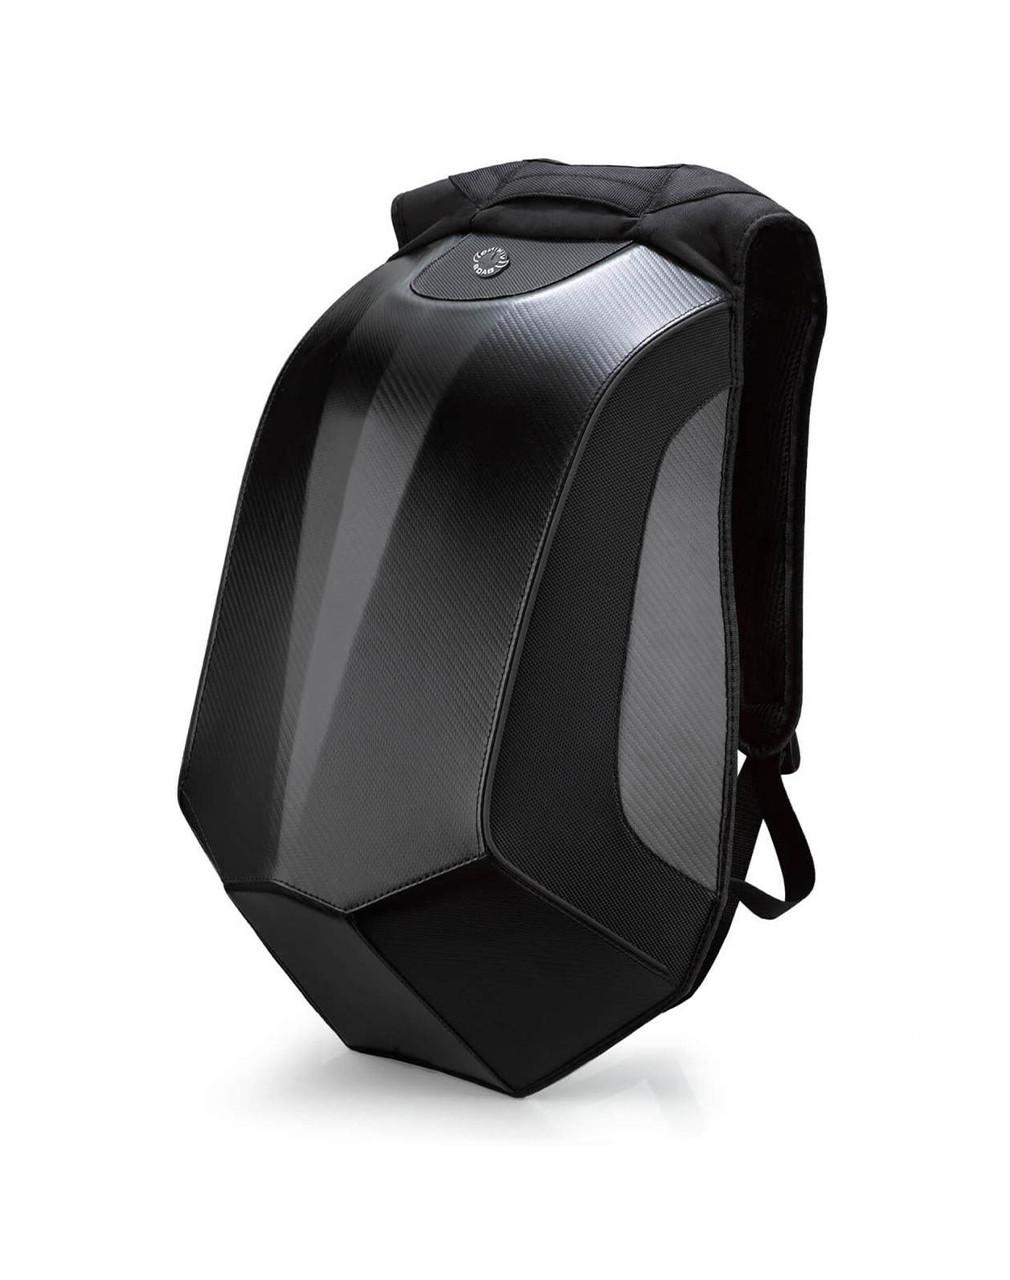 VikingBags Velocity Large Black Expandable Motorcycle Backpack Main View